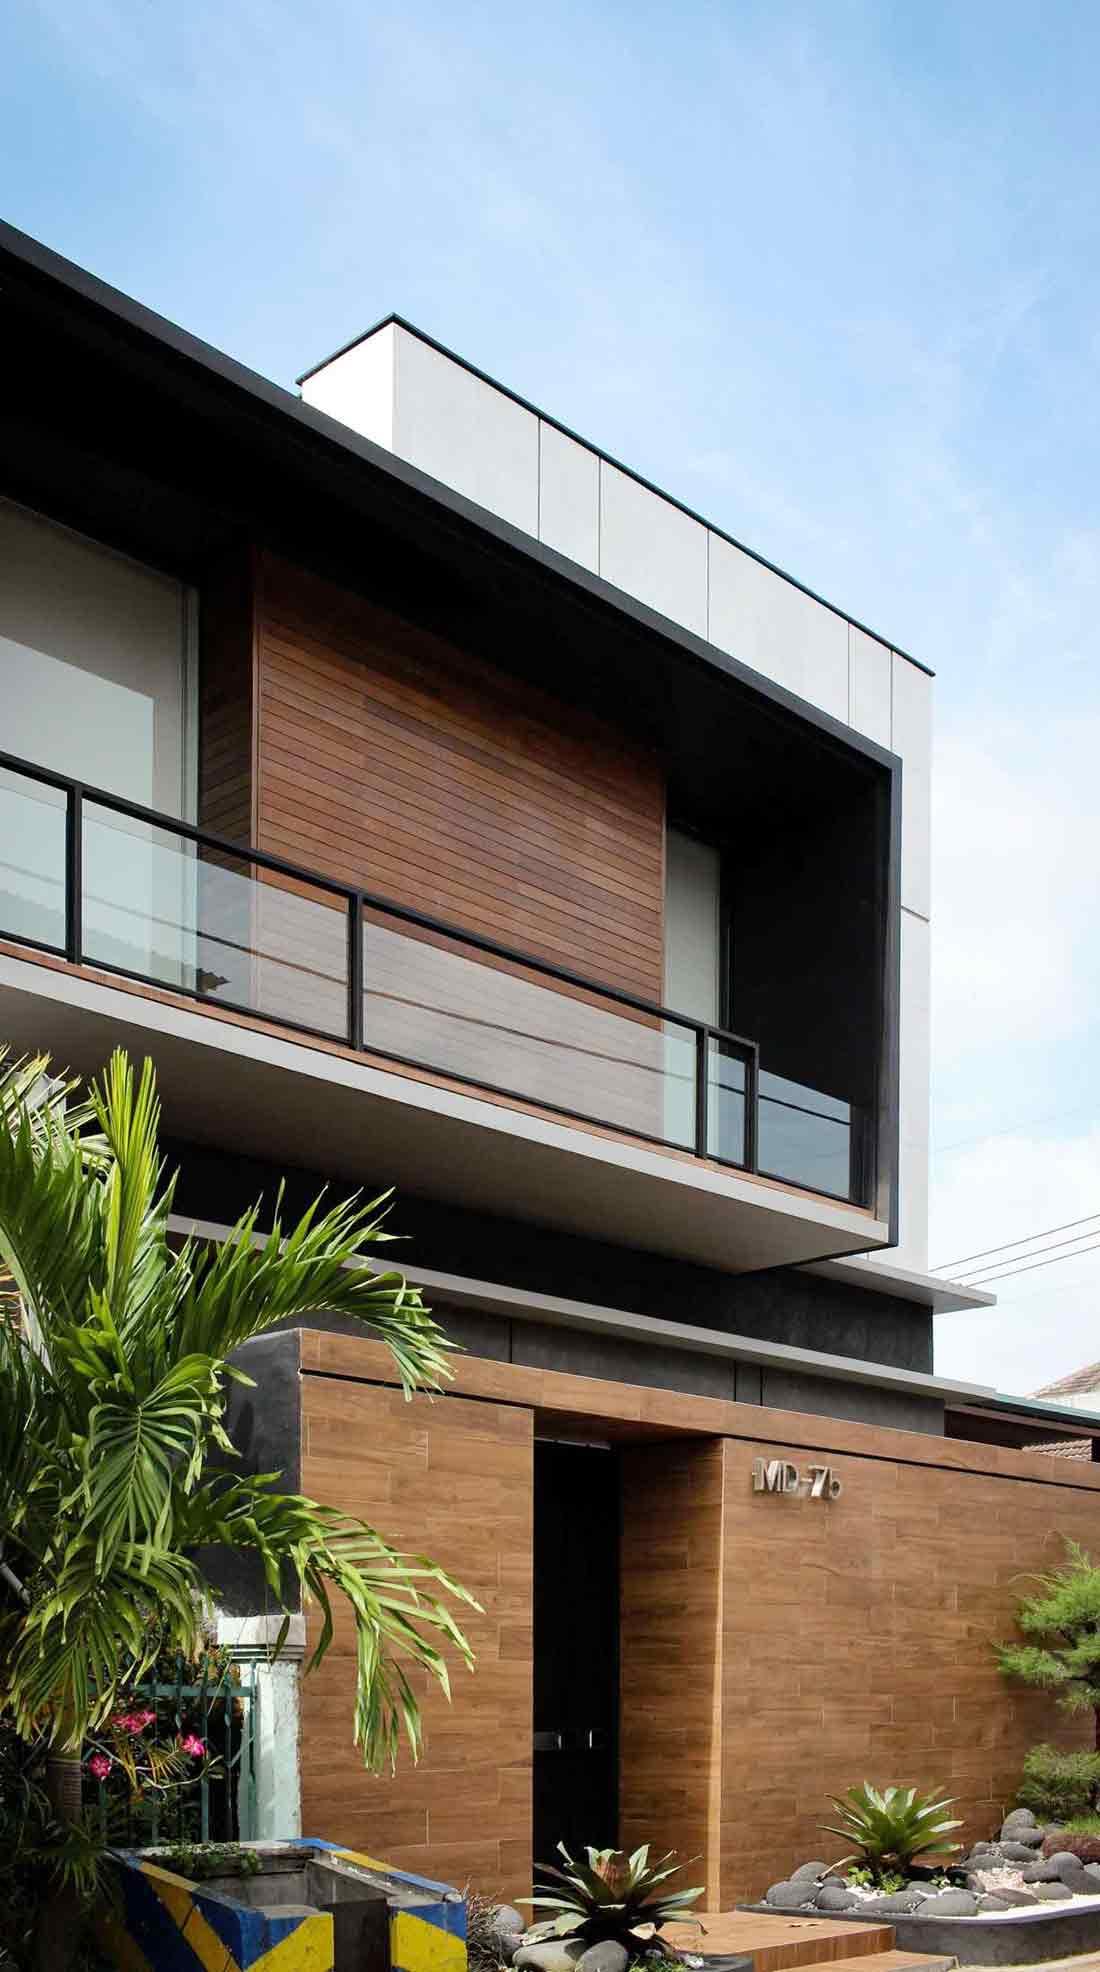 Tampilan eksterior projek J House, karya YO Design Architect, via arsitag.com